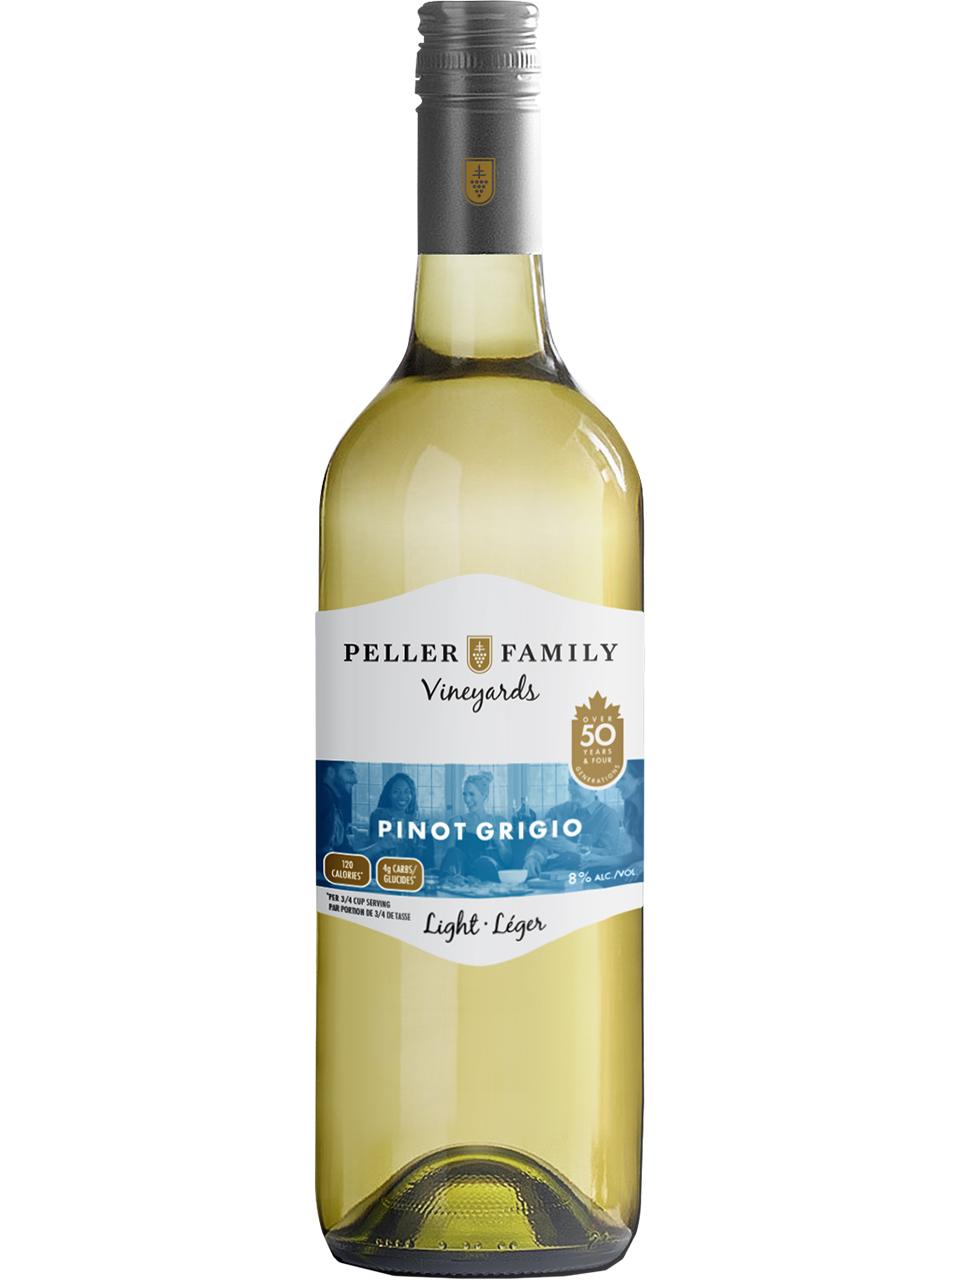 Peller Family Vineyards Light Pinot Grigio